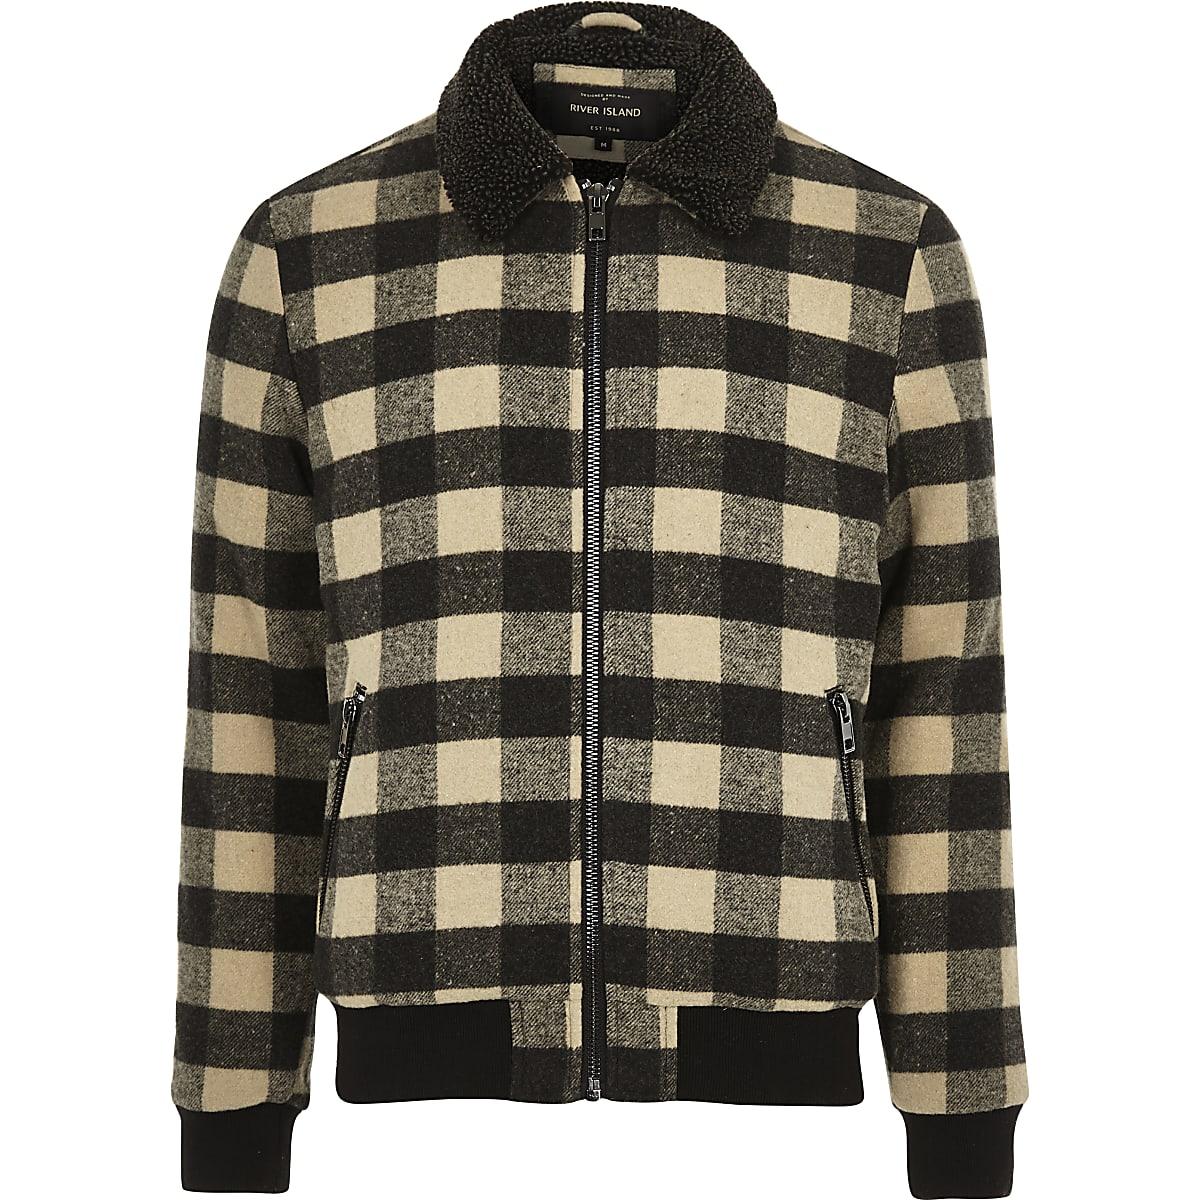 Stone check print fleece collar jacket